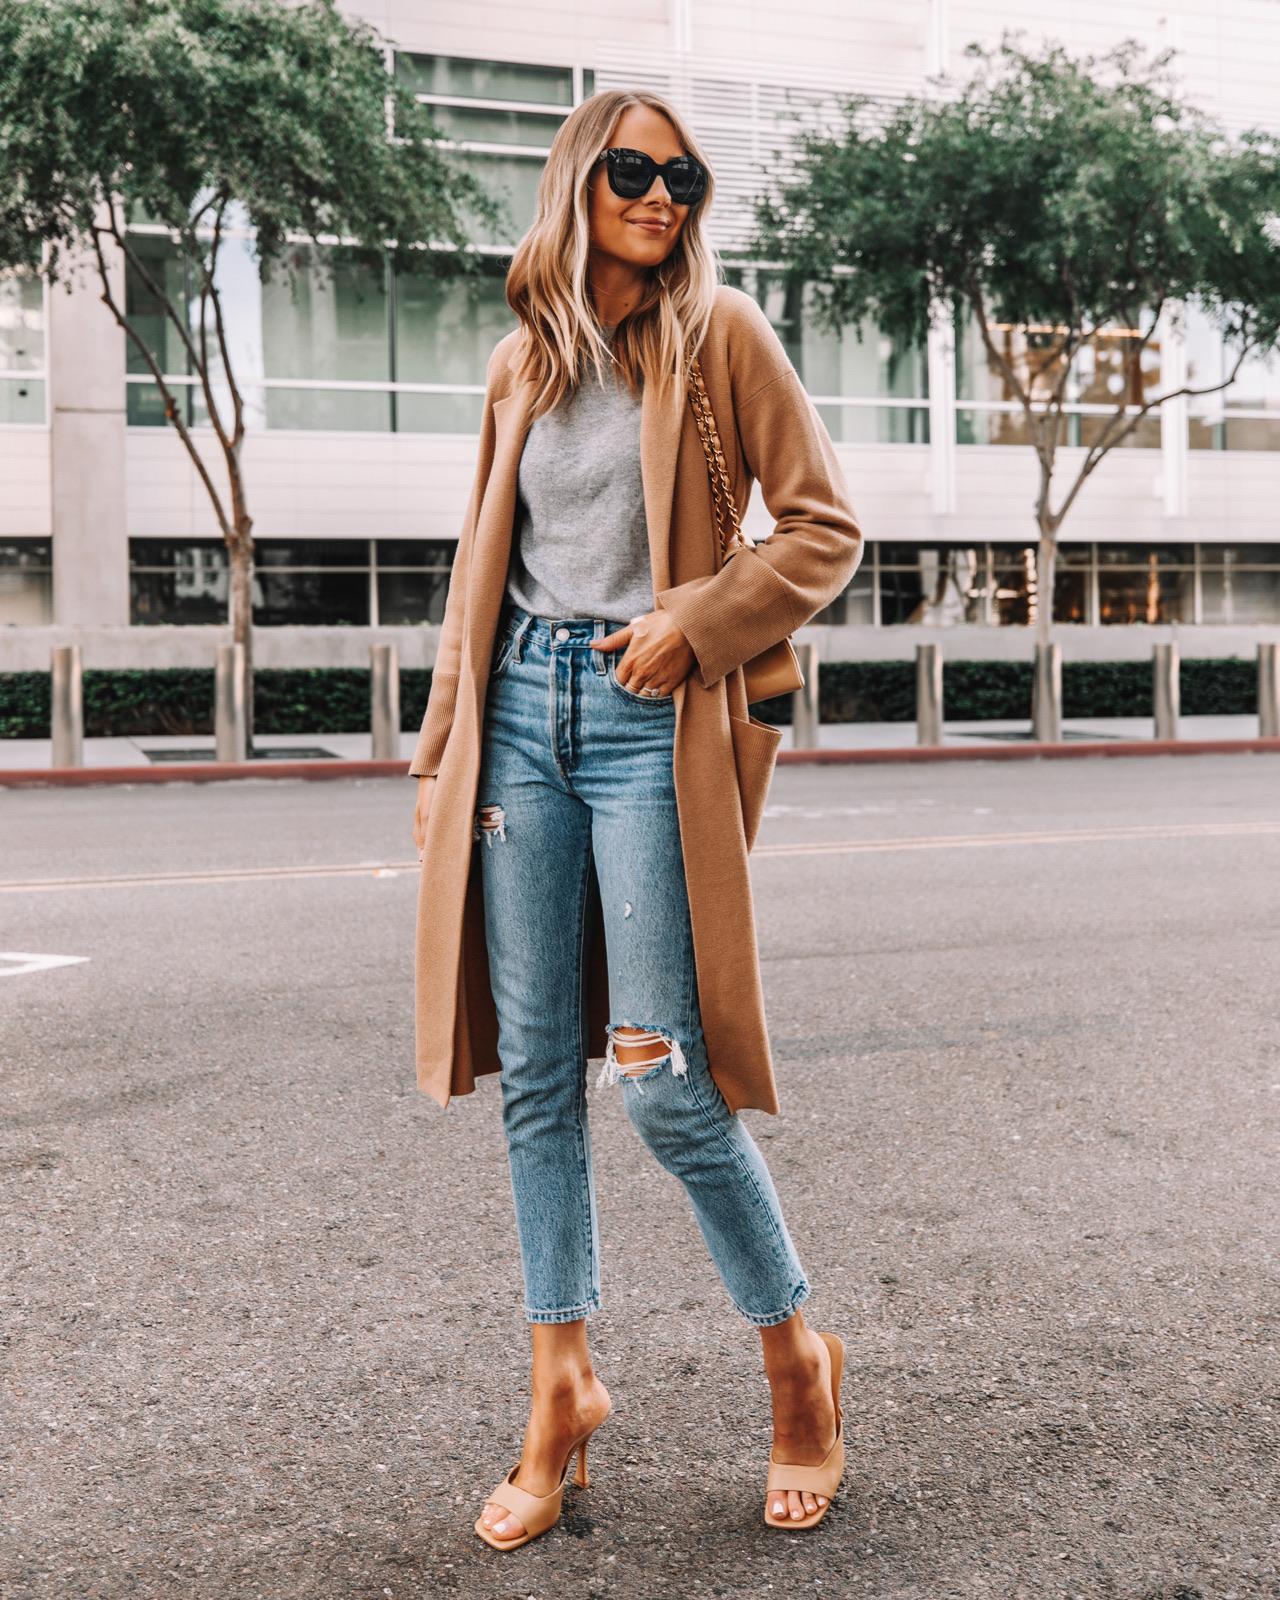 Fashion Jackson Wearing Camel Coatigan Grey Sweater Levis Ripped Jeans Nude Heels